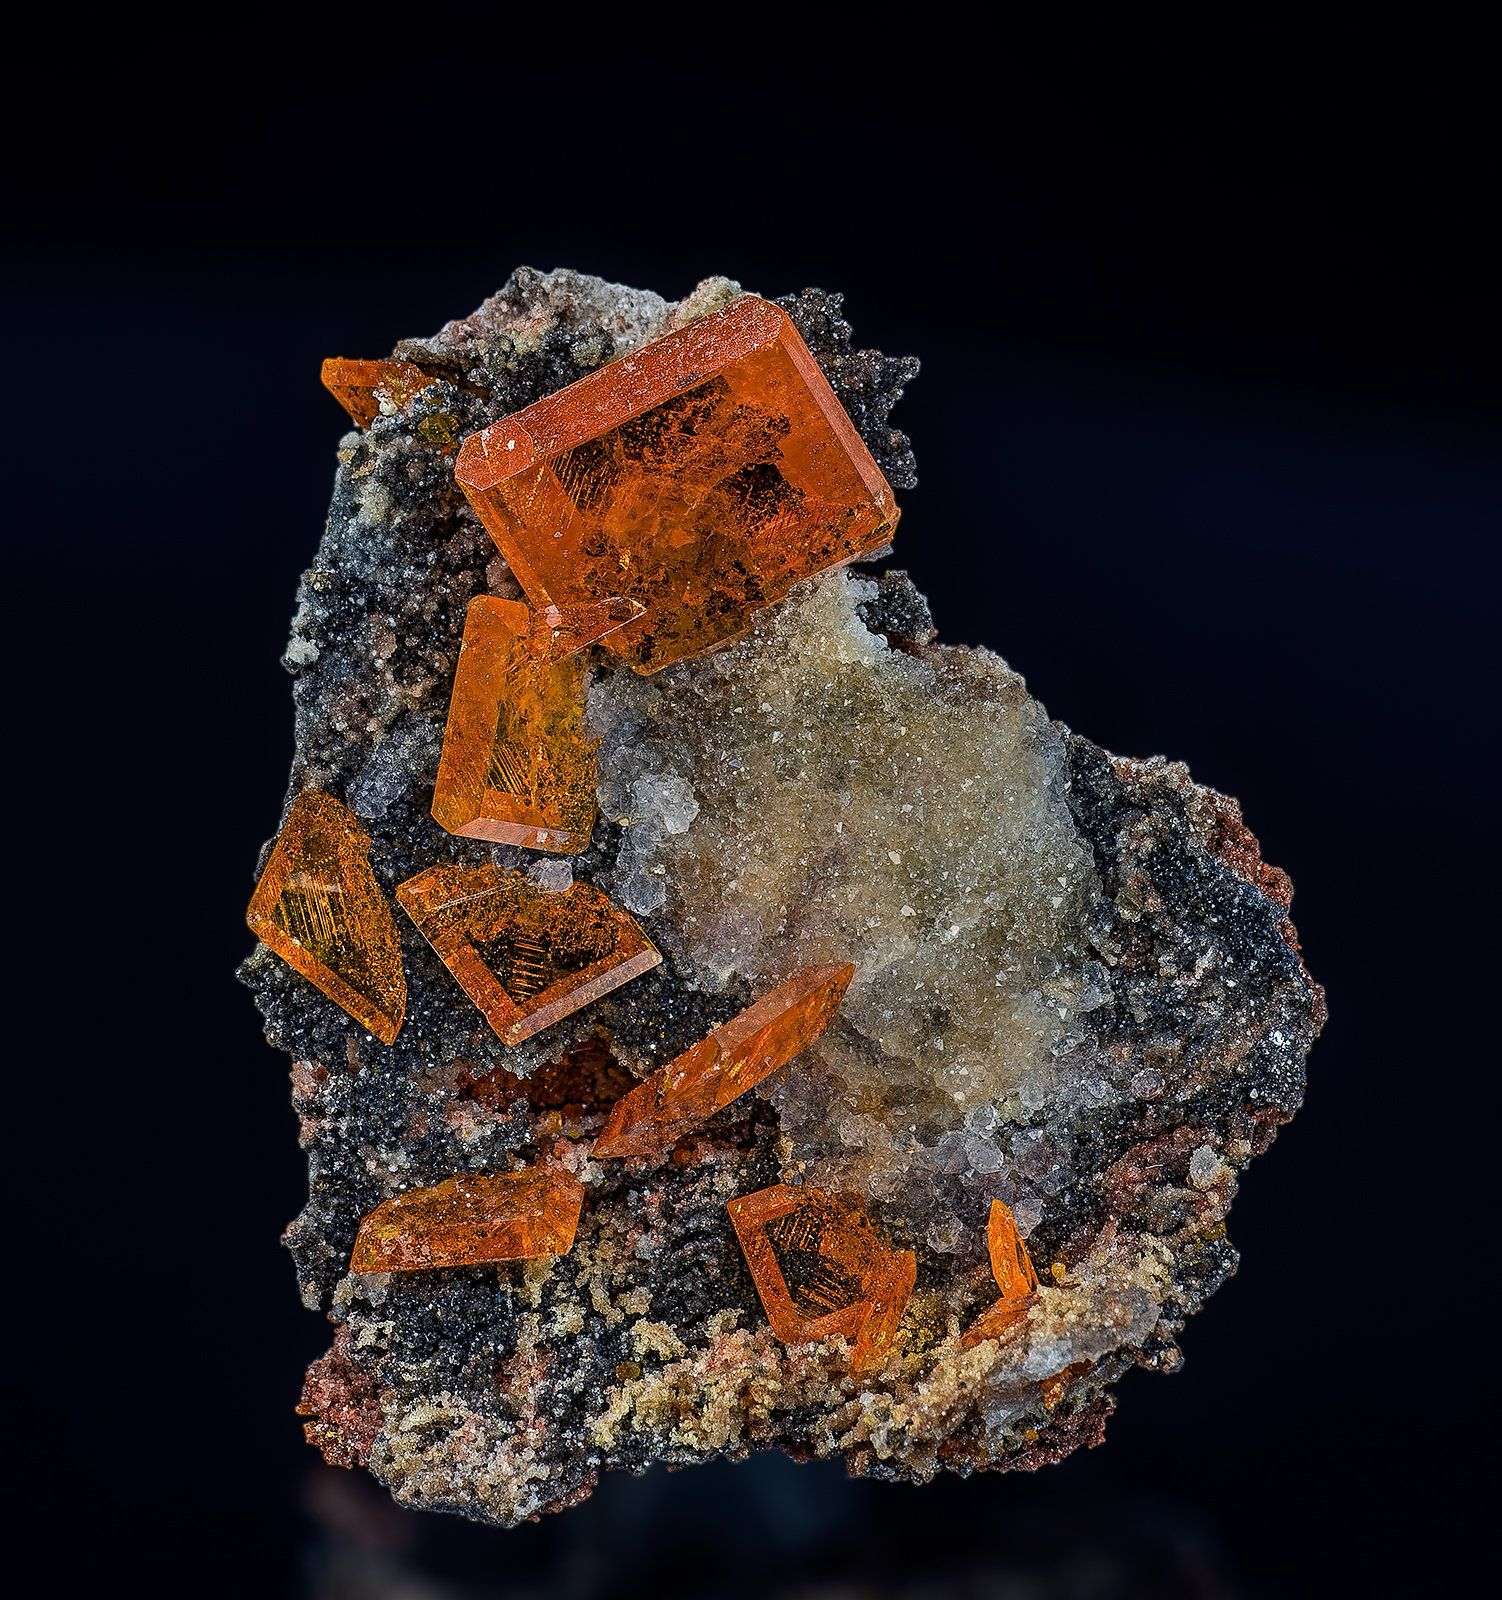 Wulfenite, Quartz Locality: Chah Milleh Mine, Chah Milleh, Anarak District, Nain County, Esfahan Province, Iran Dimensions: 3.2 x 2.7 cm